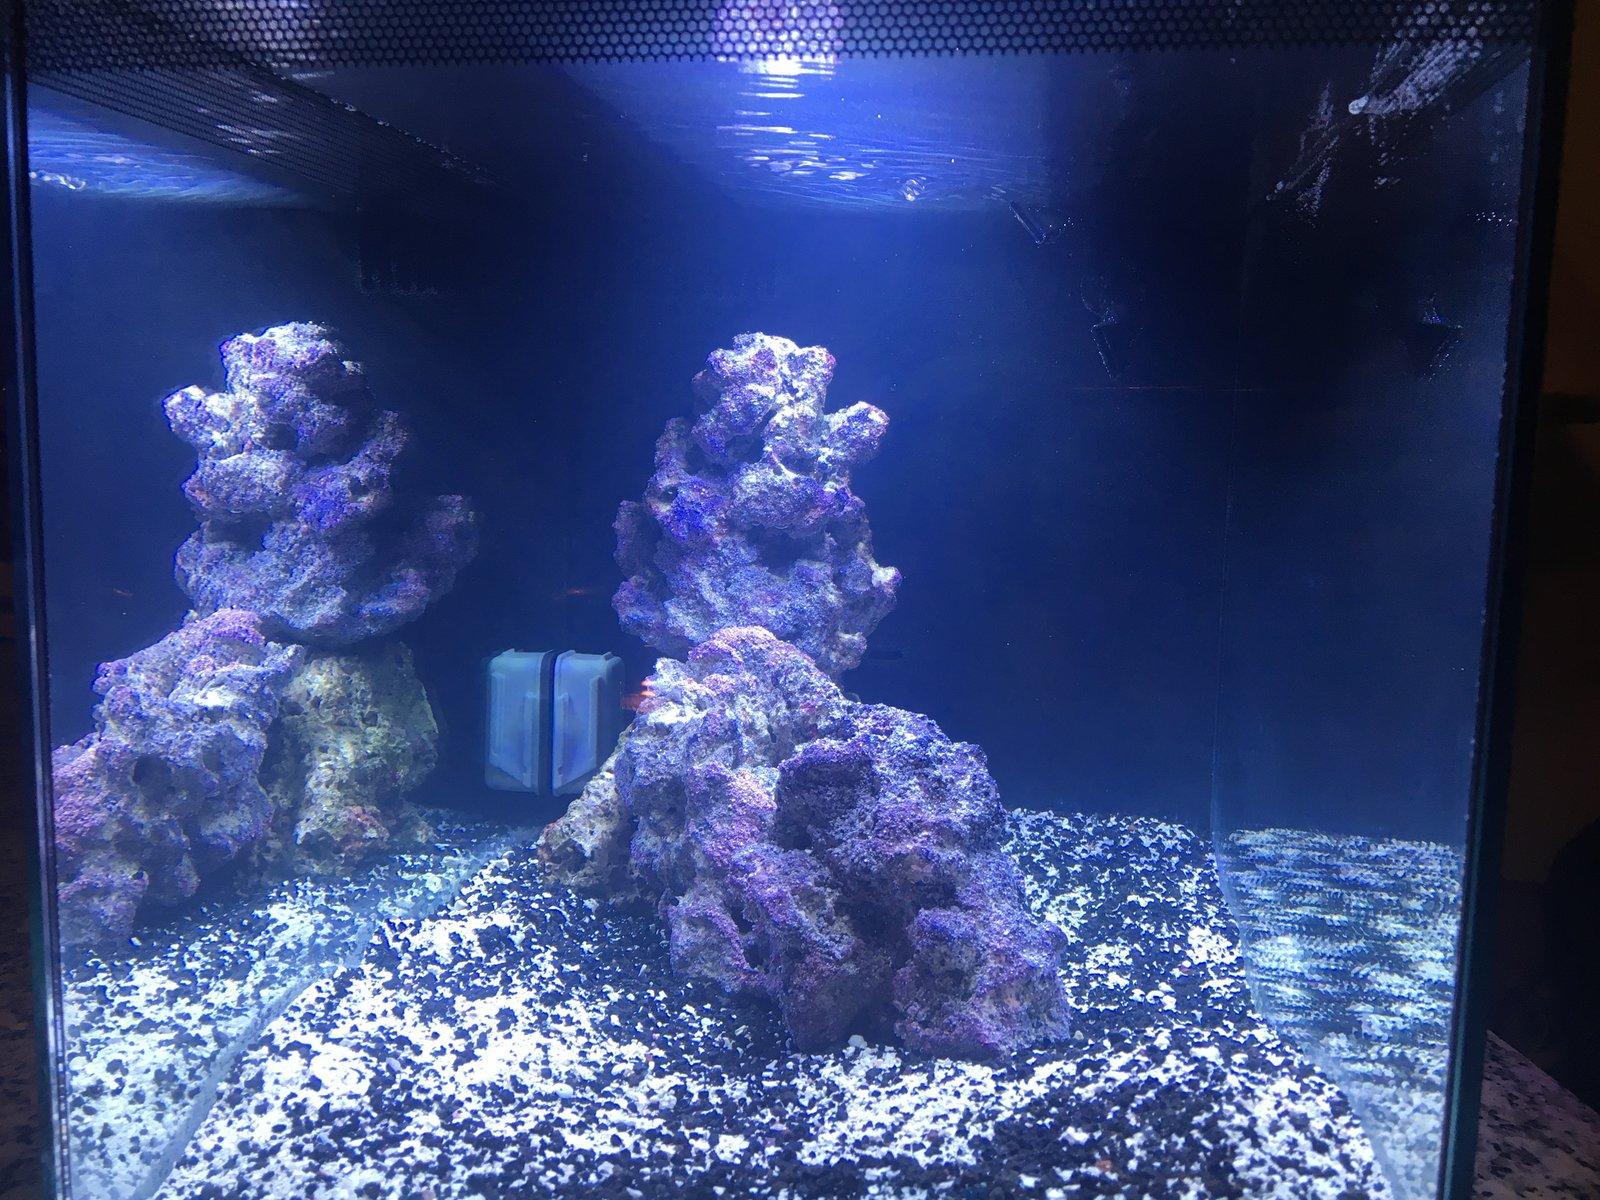 Smitten4Witten s Fluval Evo 13 5 Aquarium Journals Nano Reef